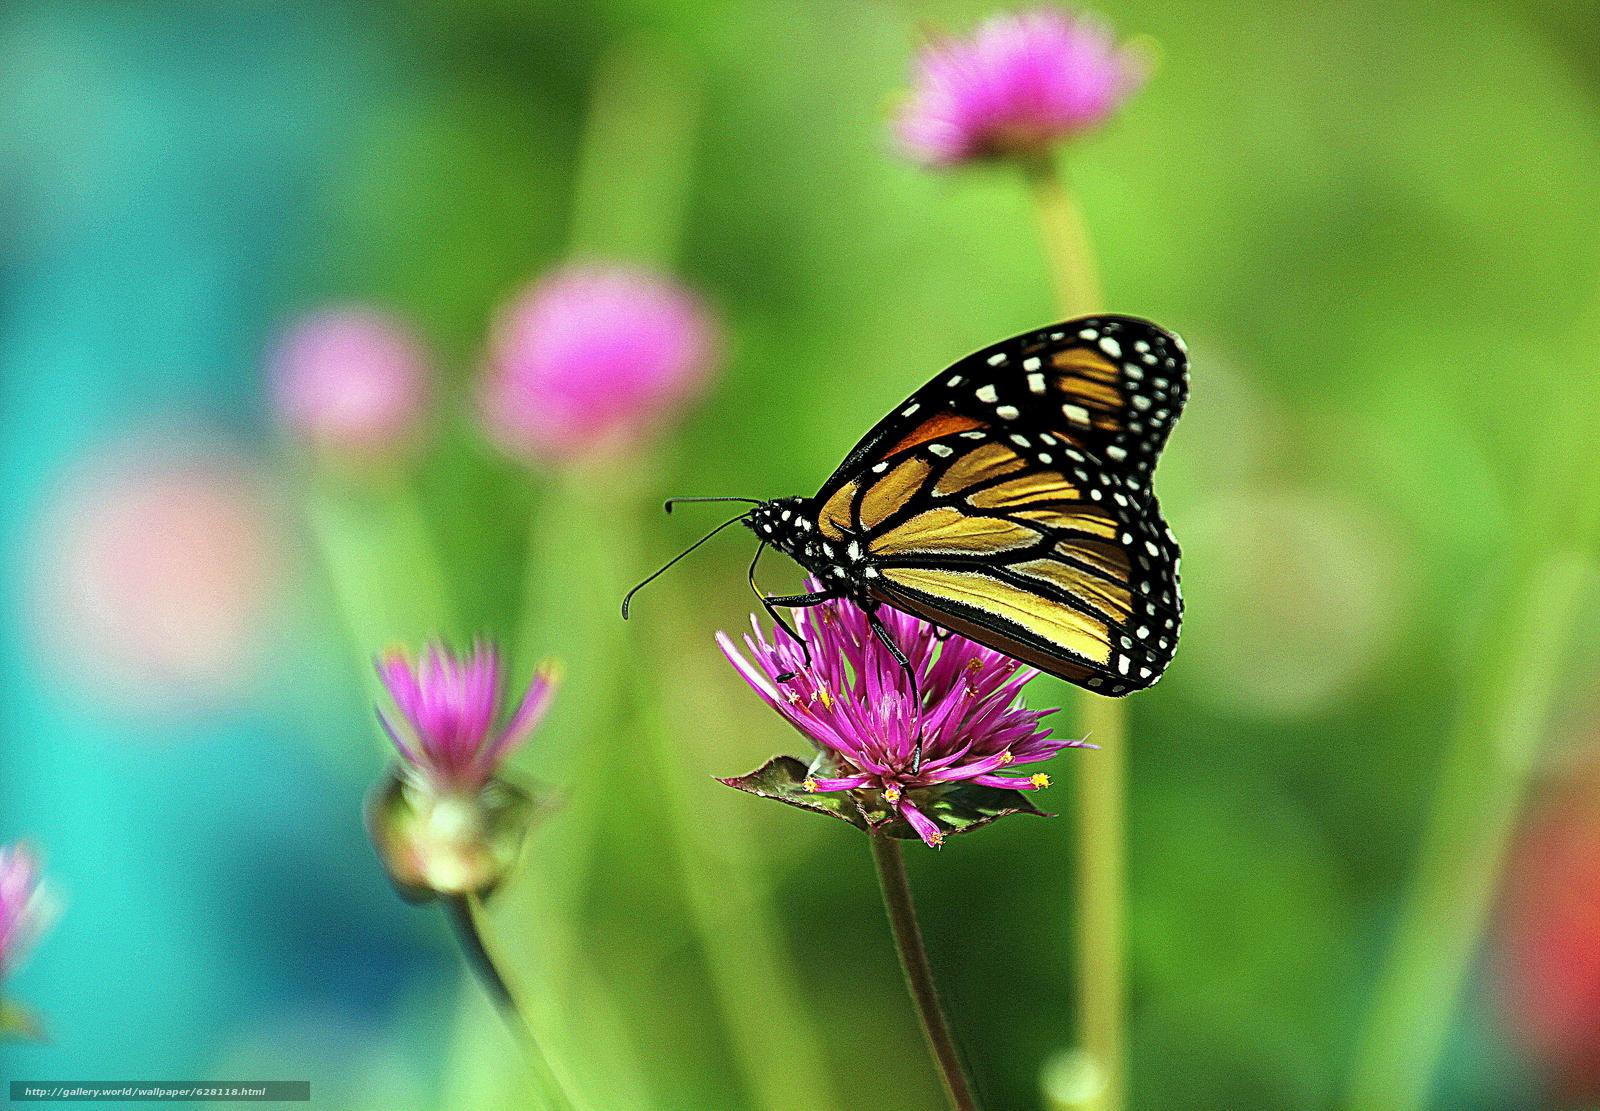 Скачать на телефон обои фото картинку на тему цветок, бабочка, макро, разширение 4863x3377